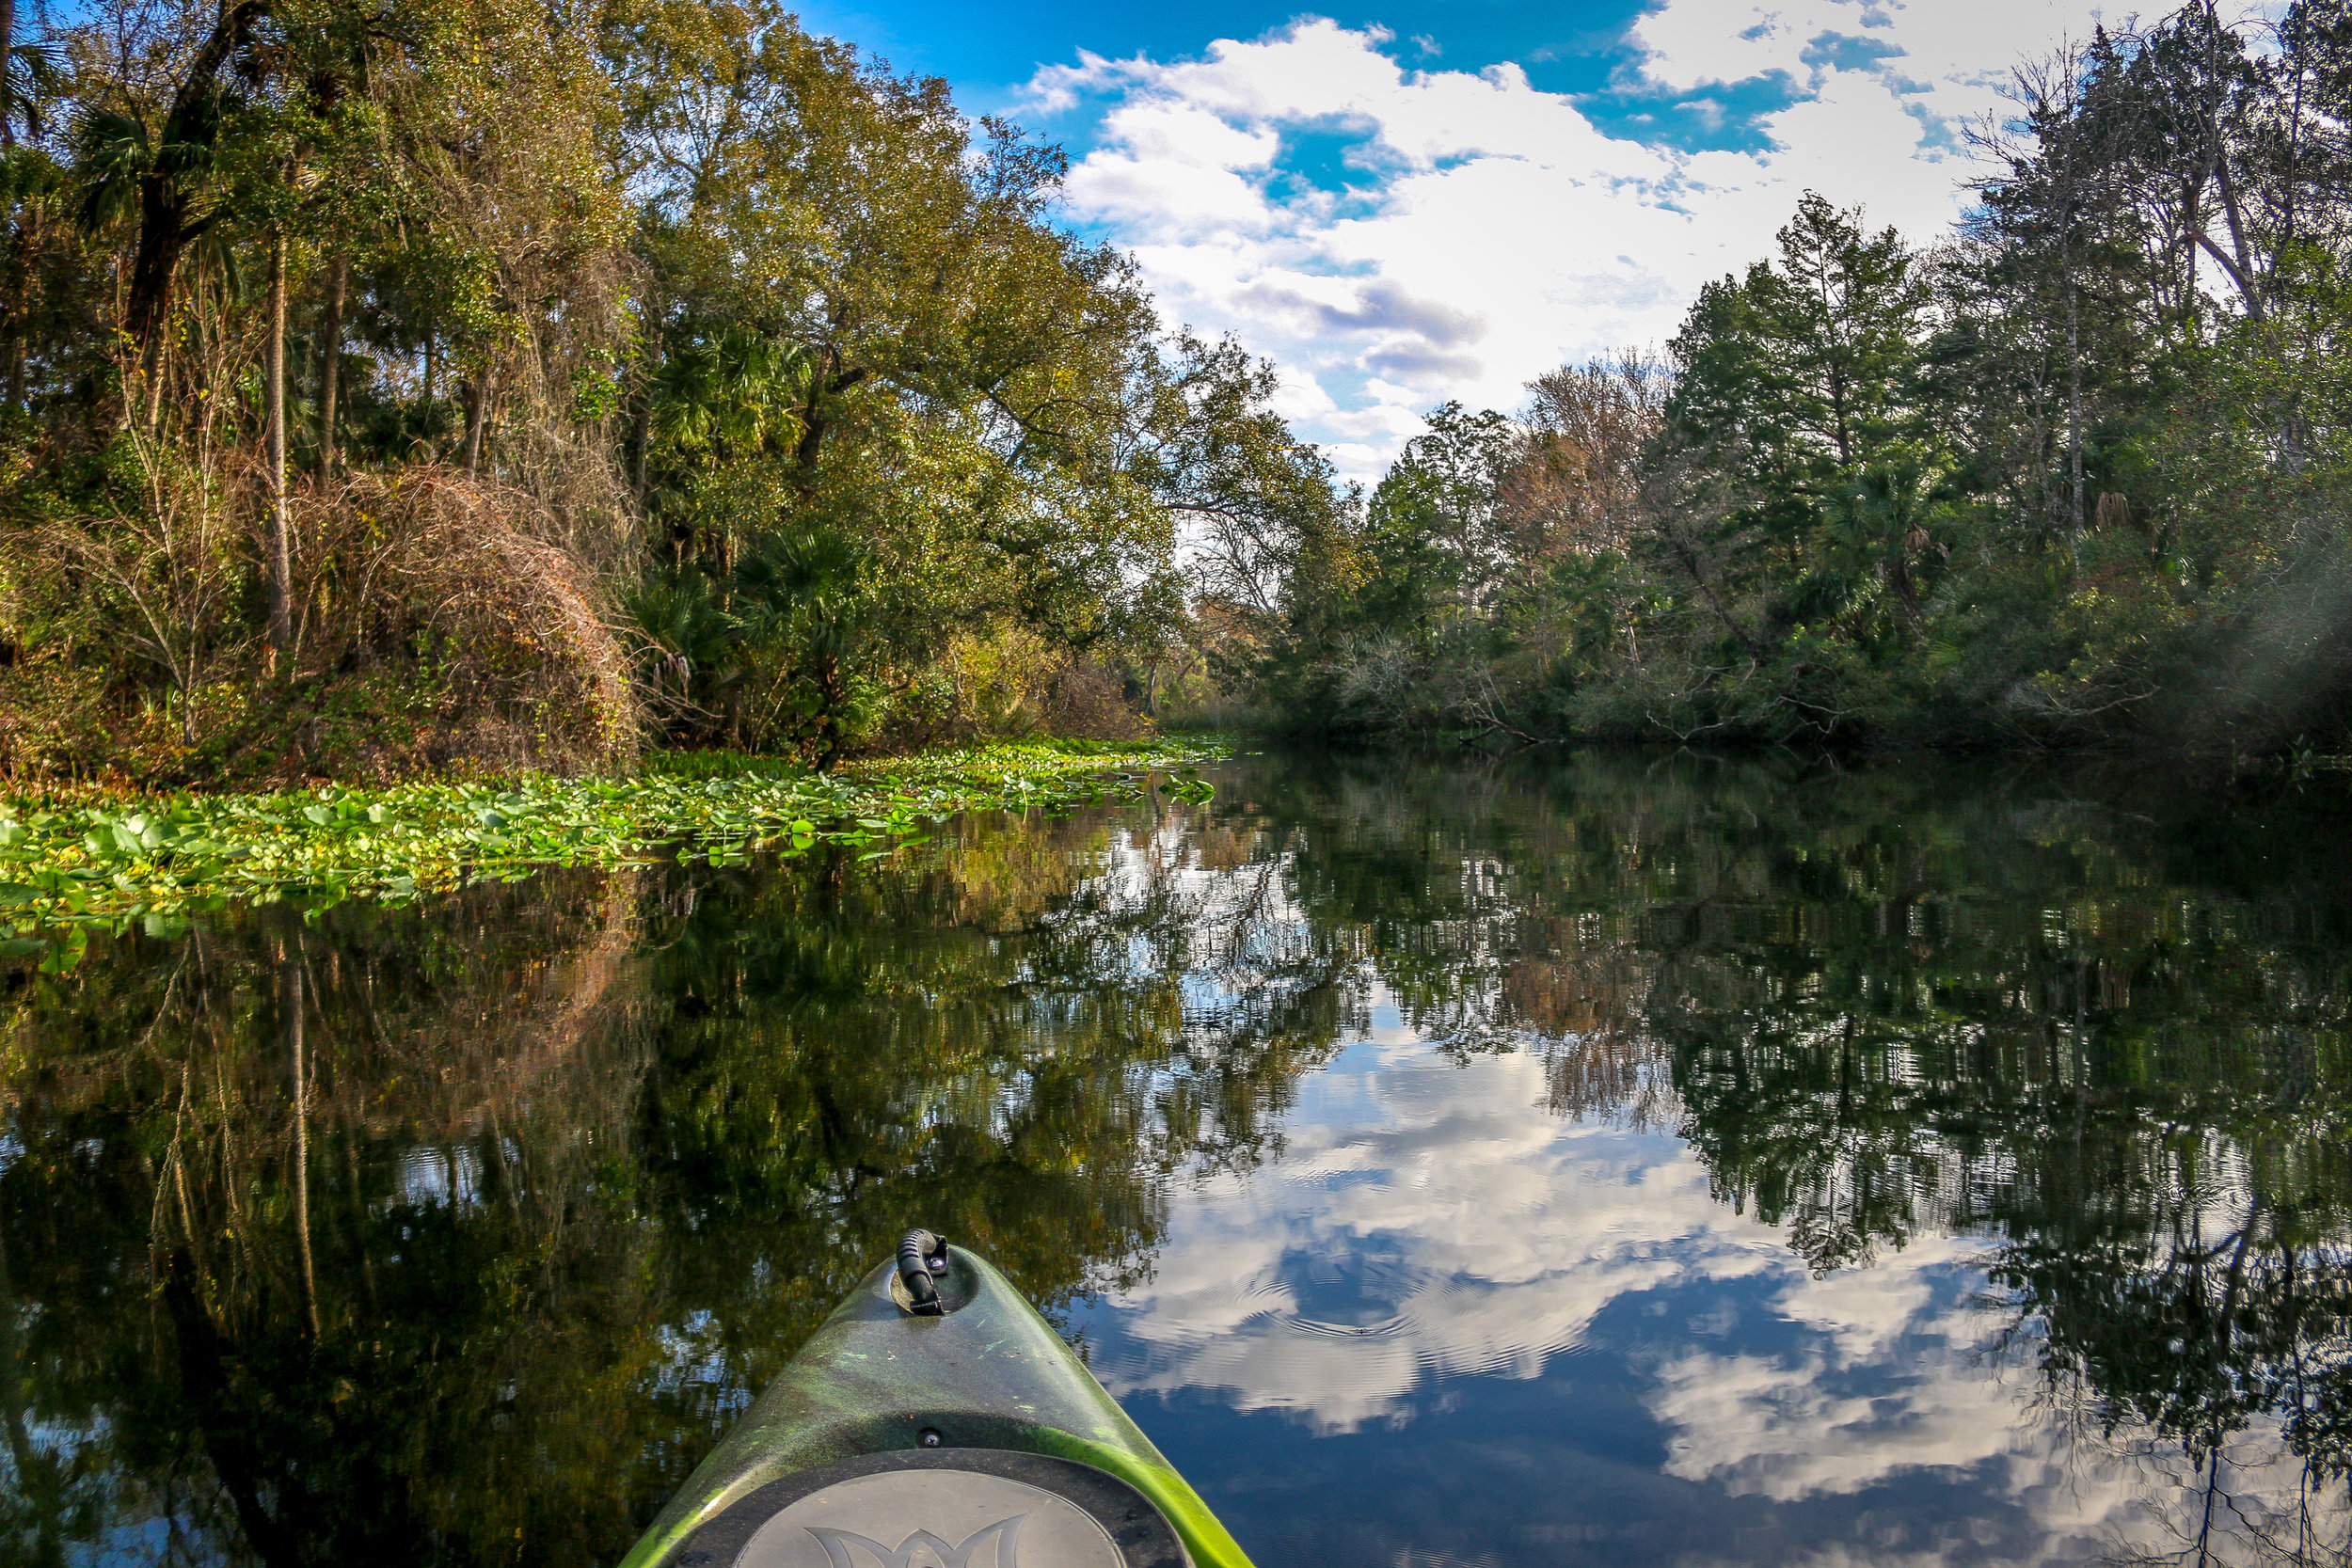 kayaking alexander springs ocala national forest